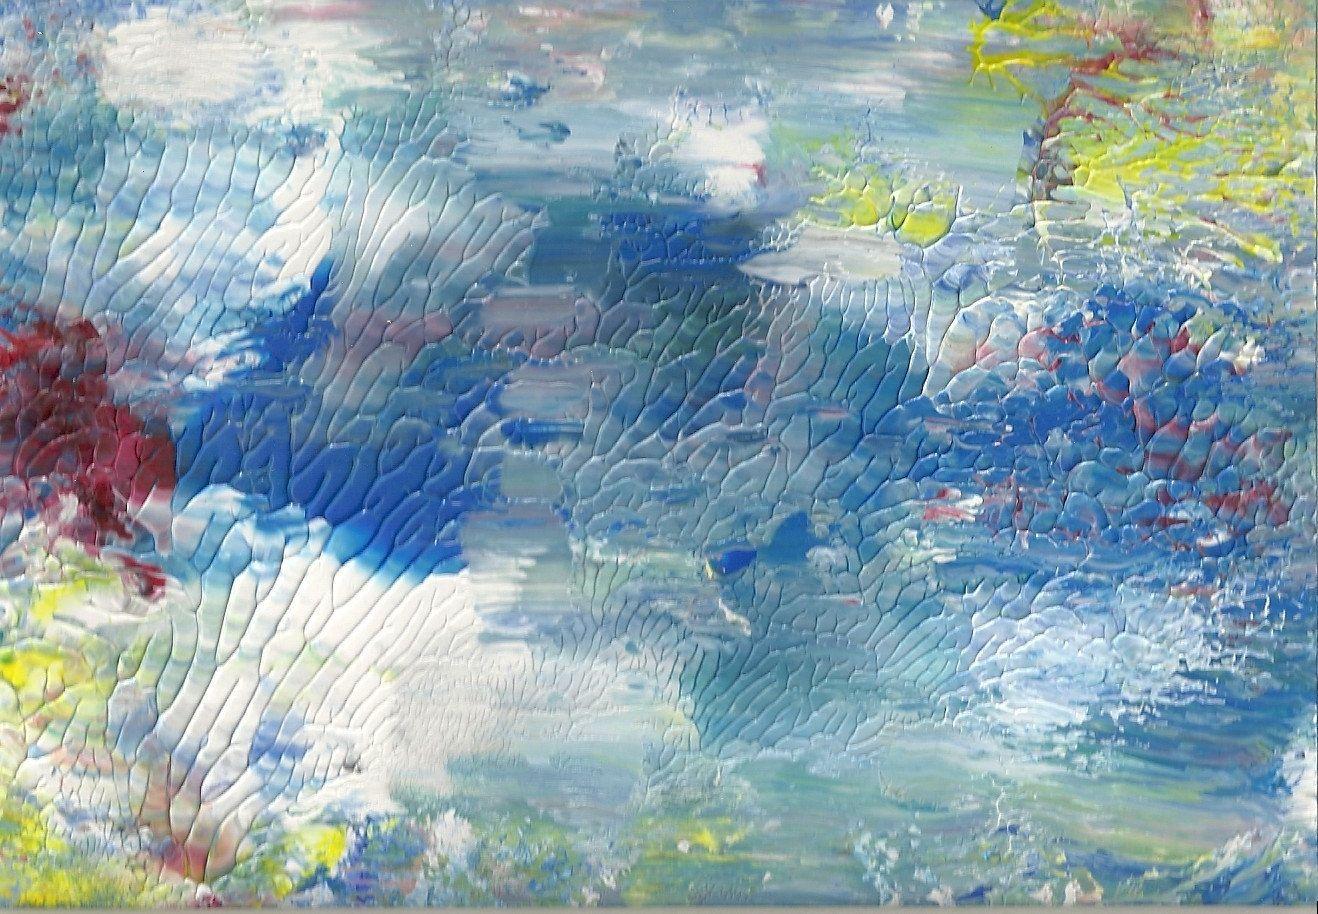 Handmade Abstract Painting S Glossy Art Print Japanese Pond